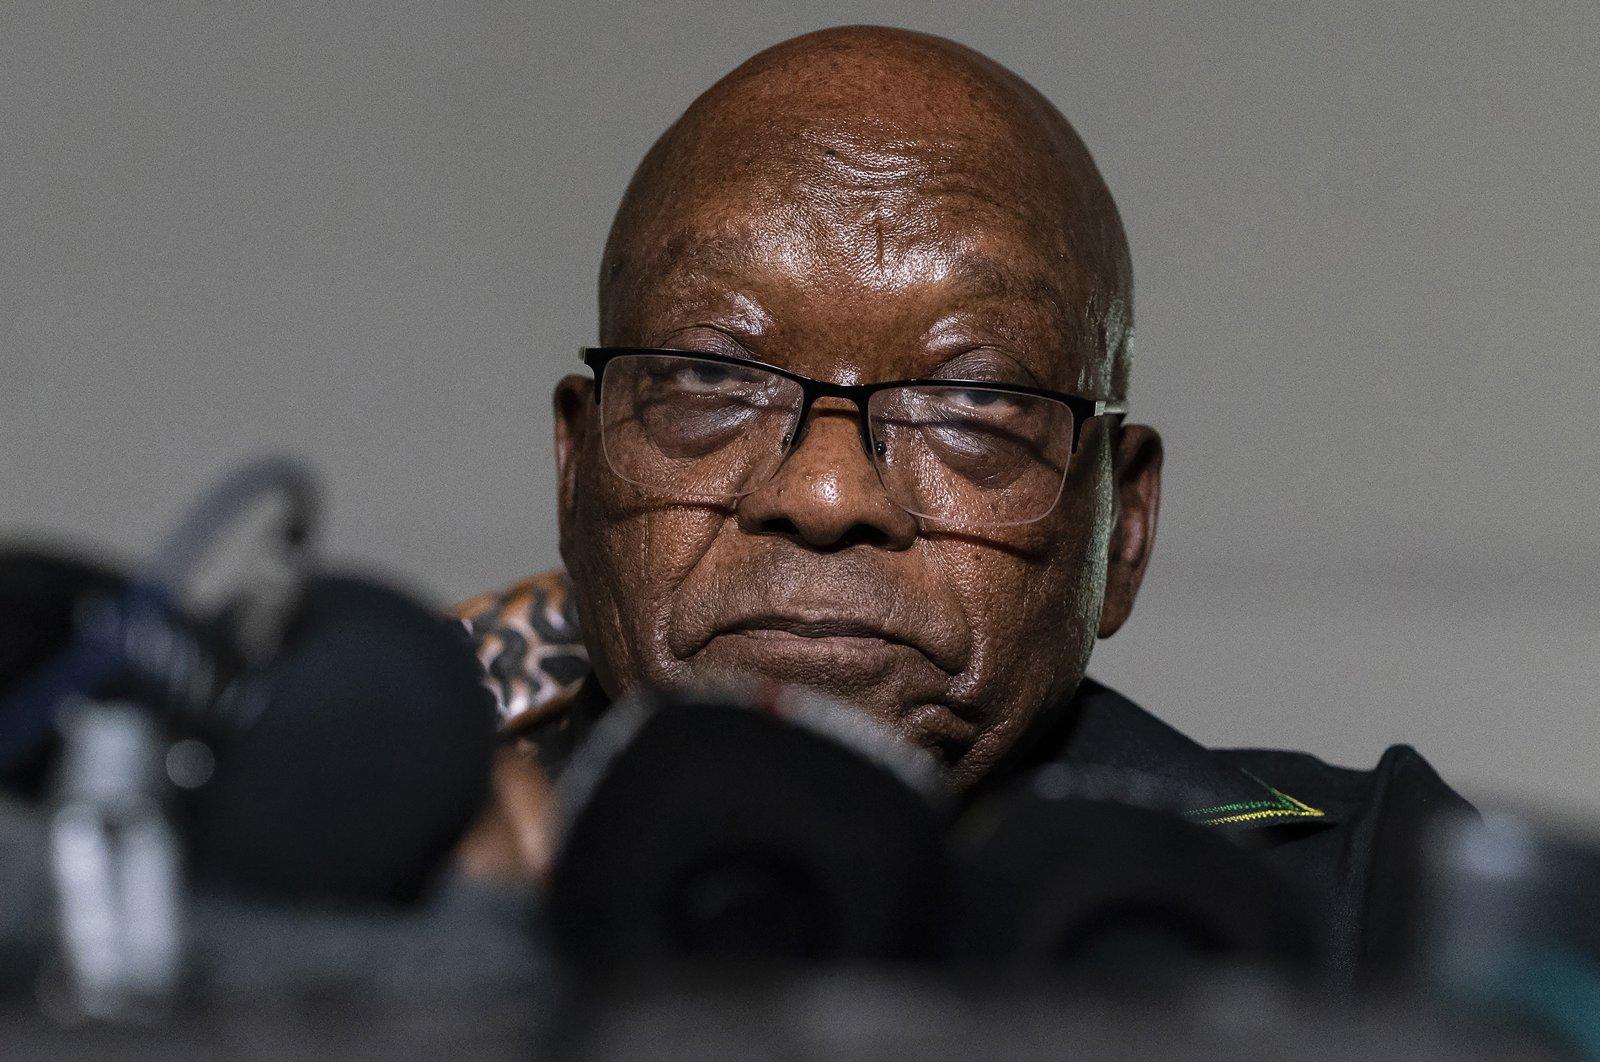 Former president Jacob Zuma addresses the press at his home in Nkandla, KwaZulu-Natal Province, South Africa, July 4, 2021. (AP File Photo)